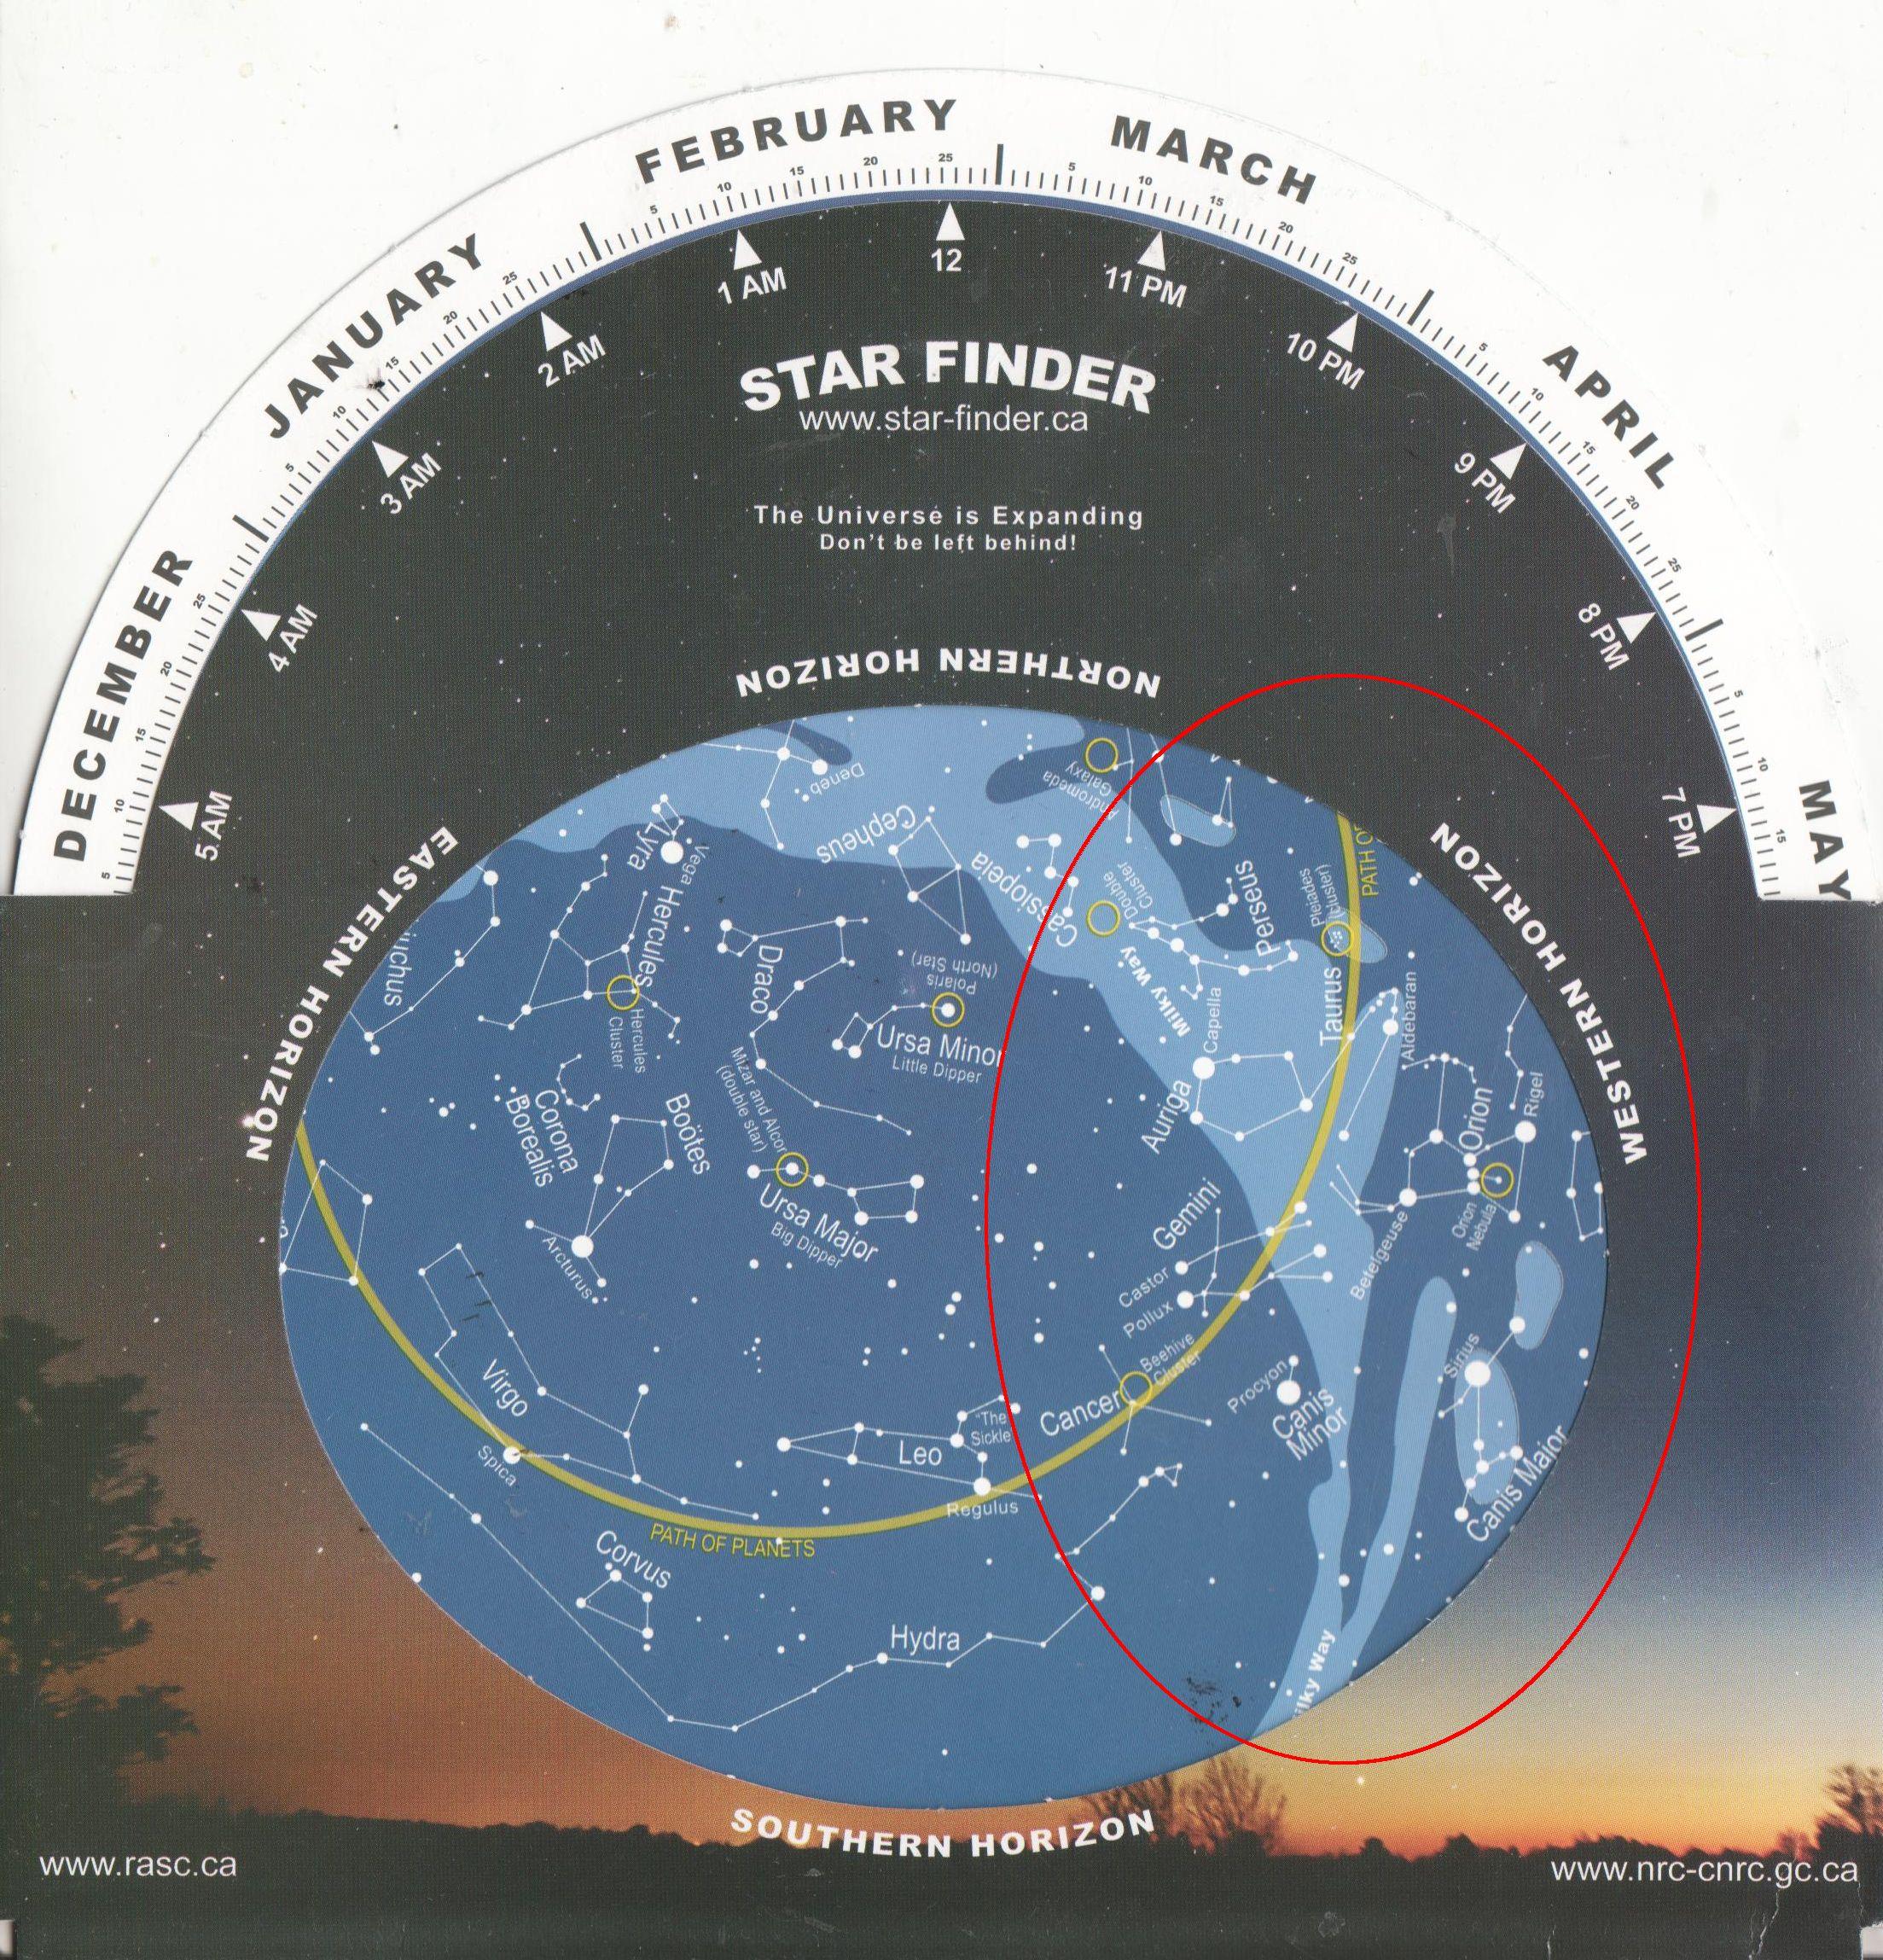 planisphereWest